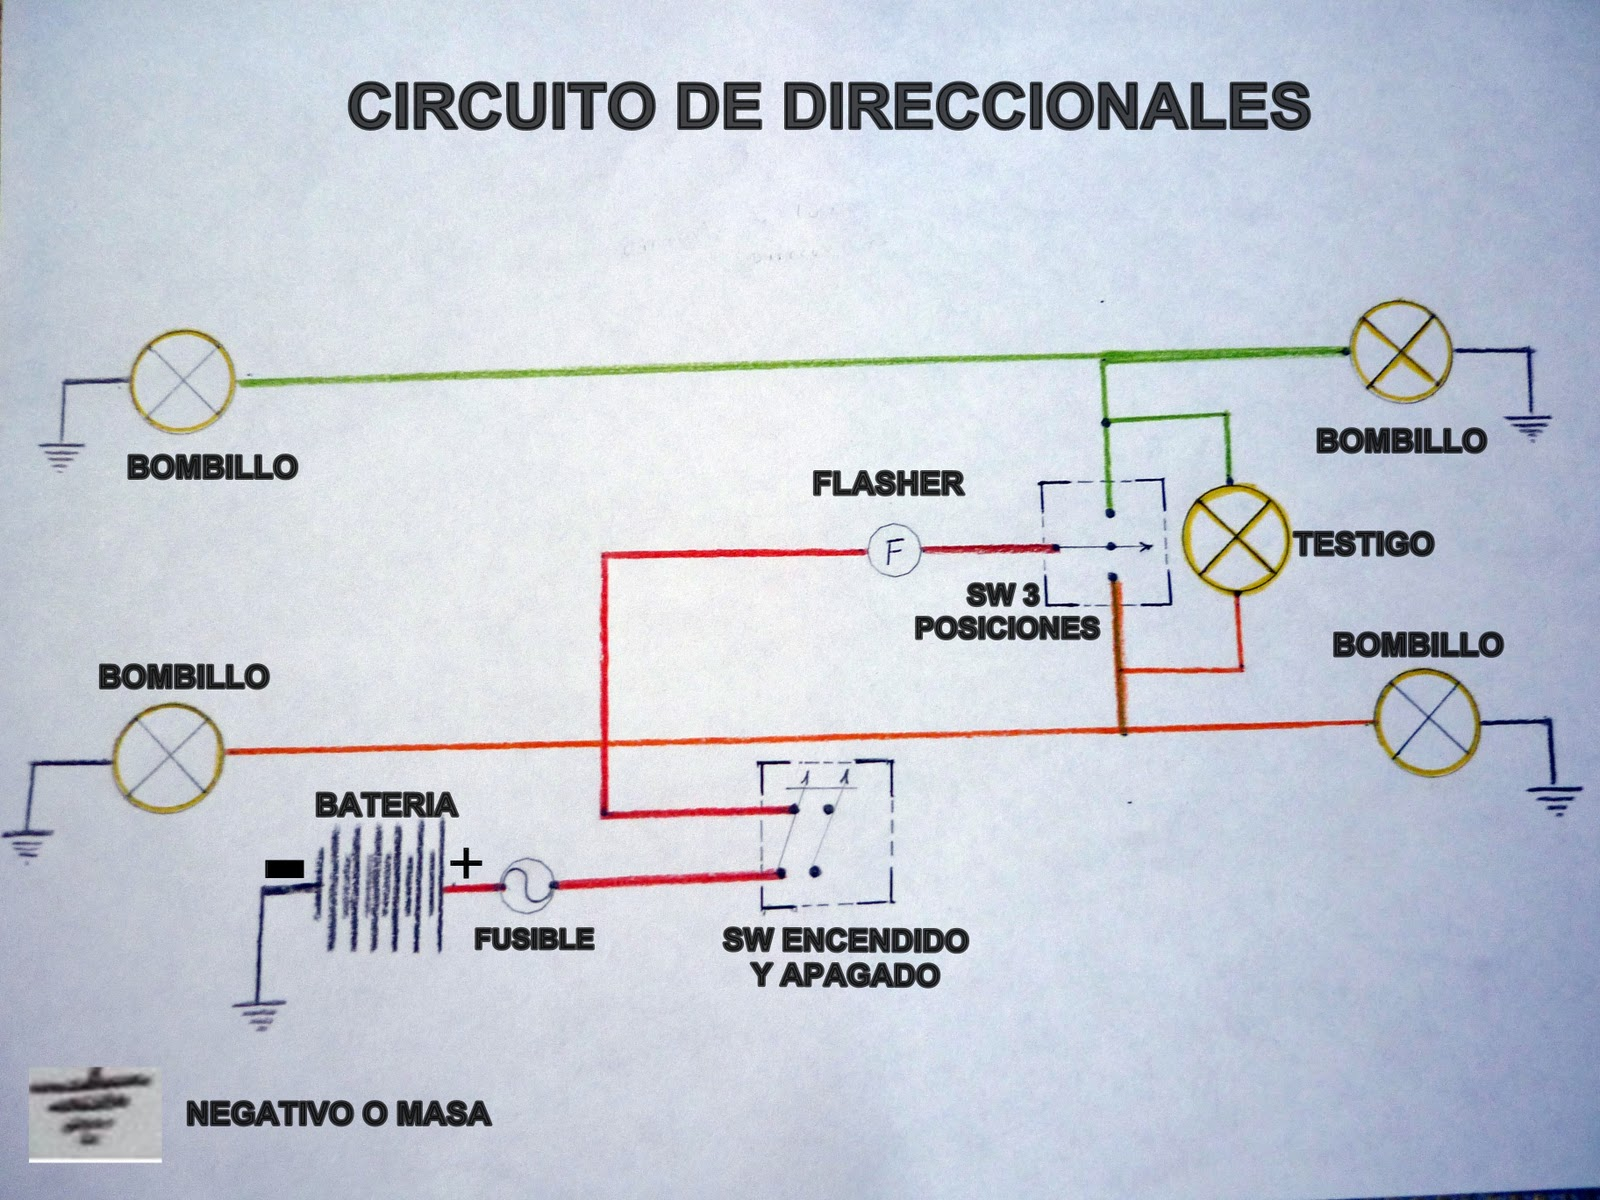 Actron Cp9087 Engine Ignition Module also Travajo Final De Circuito De Motos also Inte further DmhmLXVoZi1kdXBsZXhlci1zY2hlbWF0aWM together with 9 Exemple De Preavis. on cdi circuit